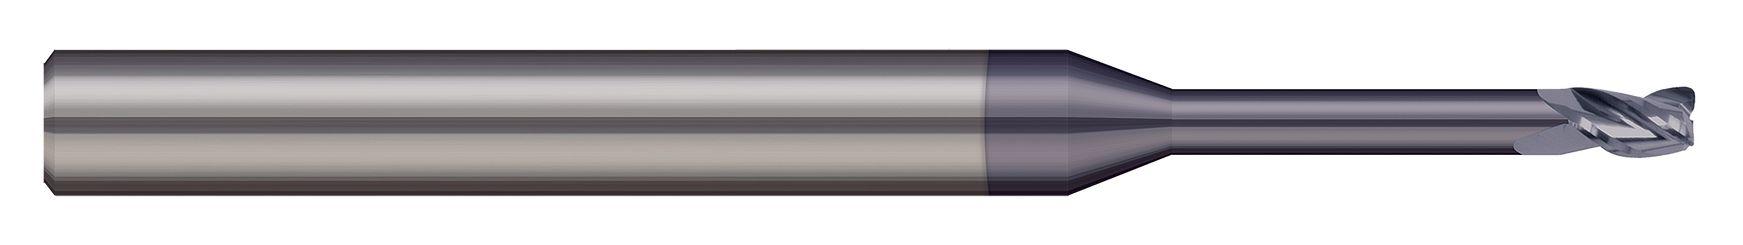 End Mills for Steels & High Temperature Alloys- Corner Radius -2 & 3 Flute - Long Reach, Stub Flute